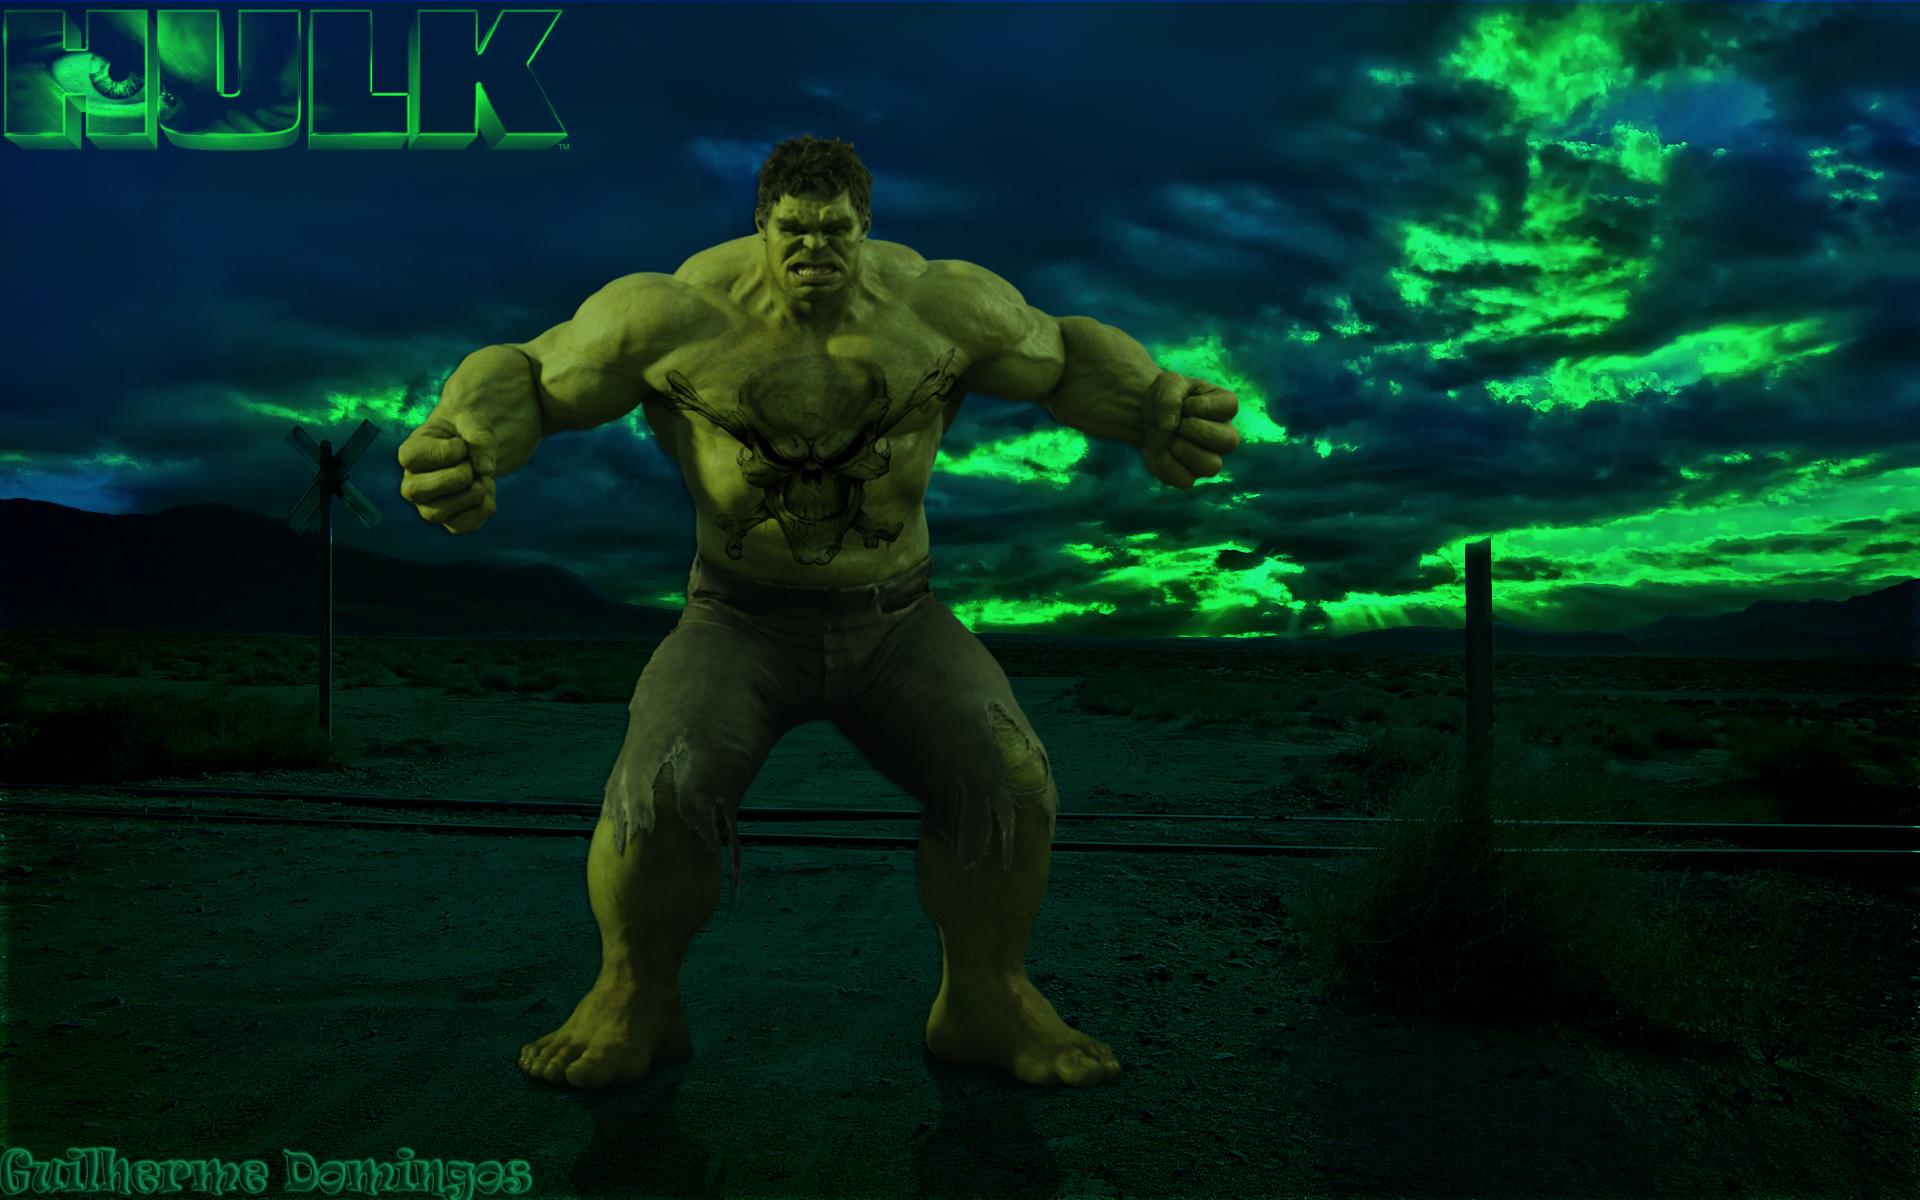 Hulk By Guilherme